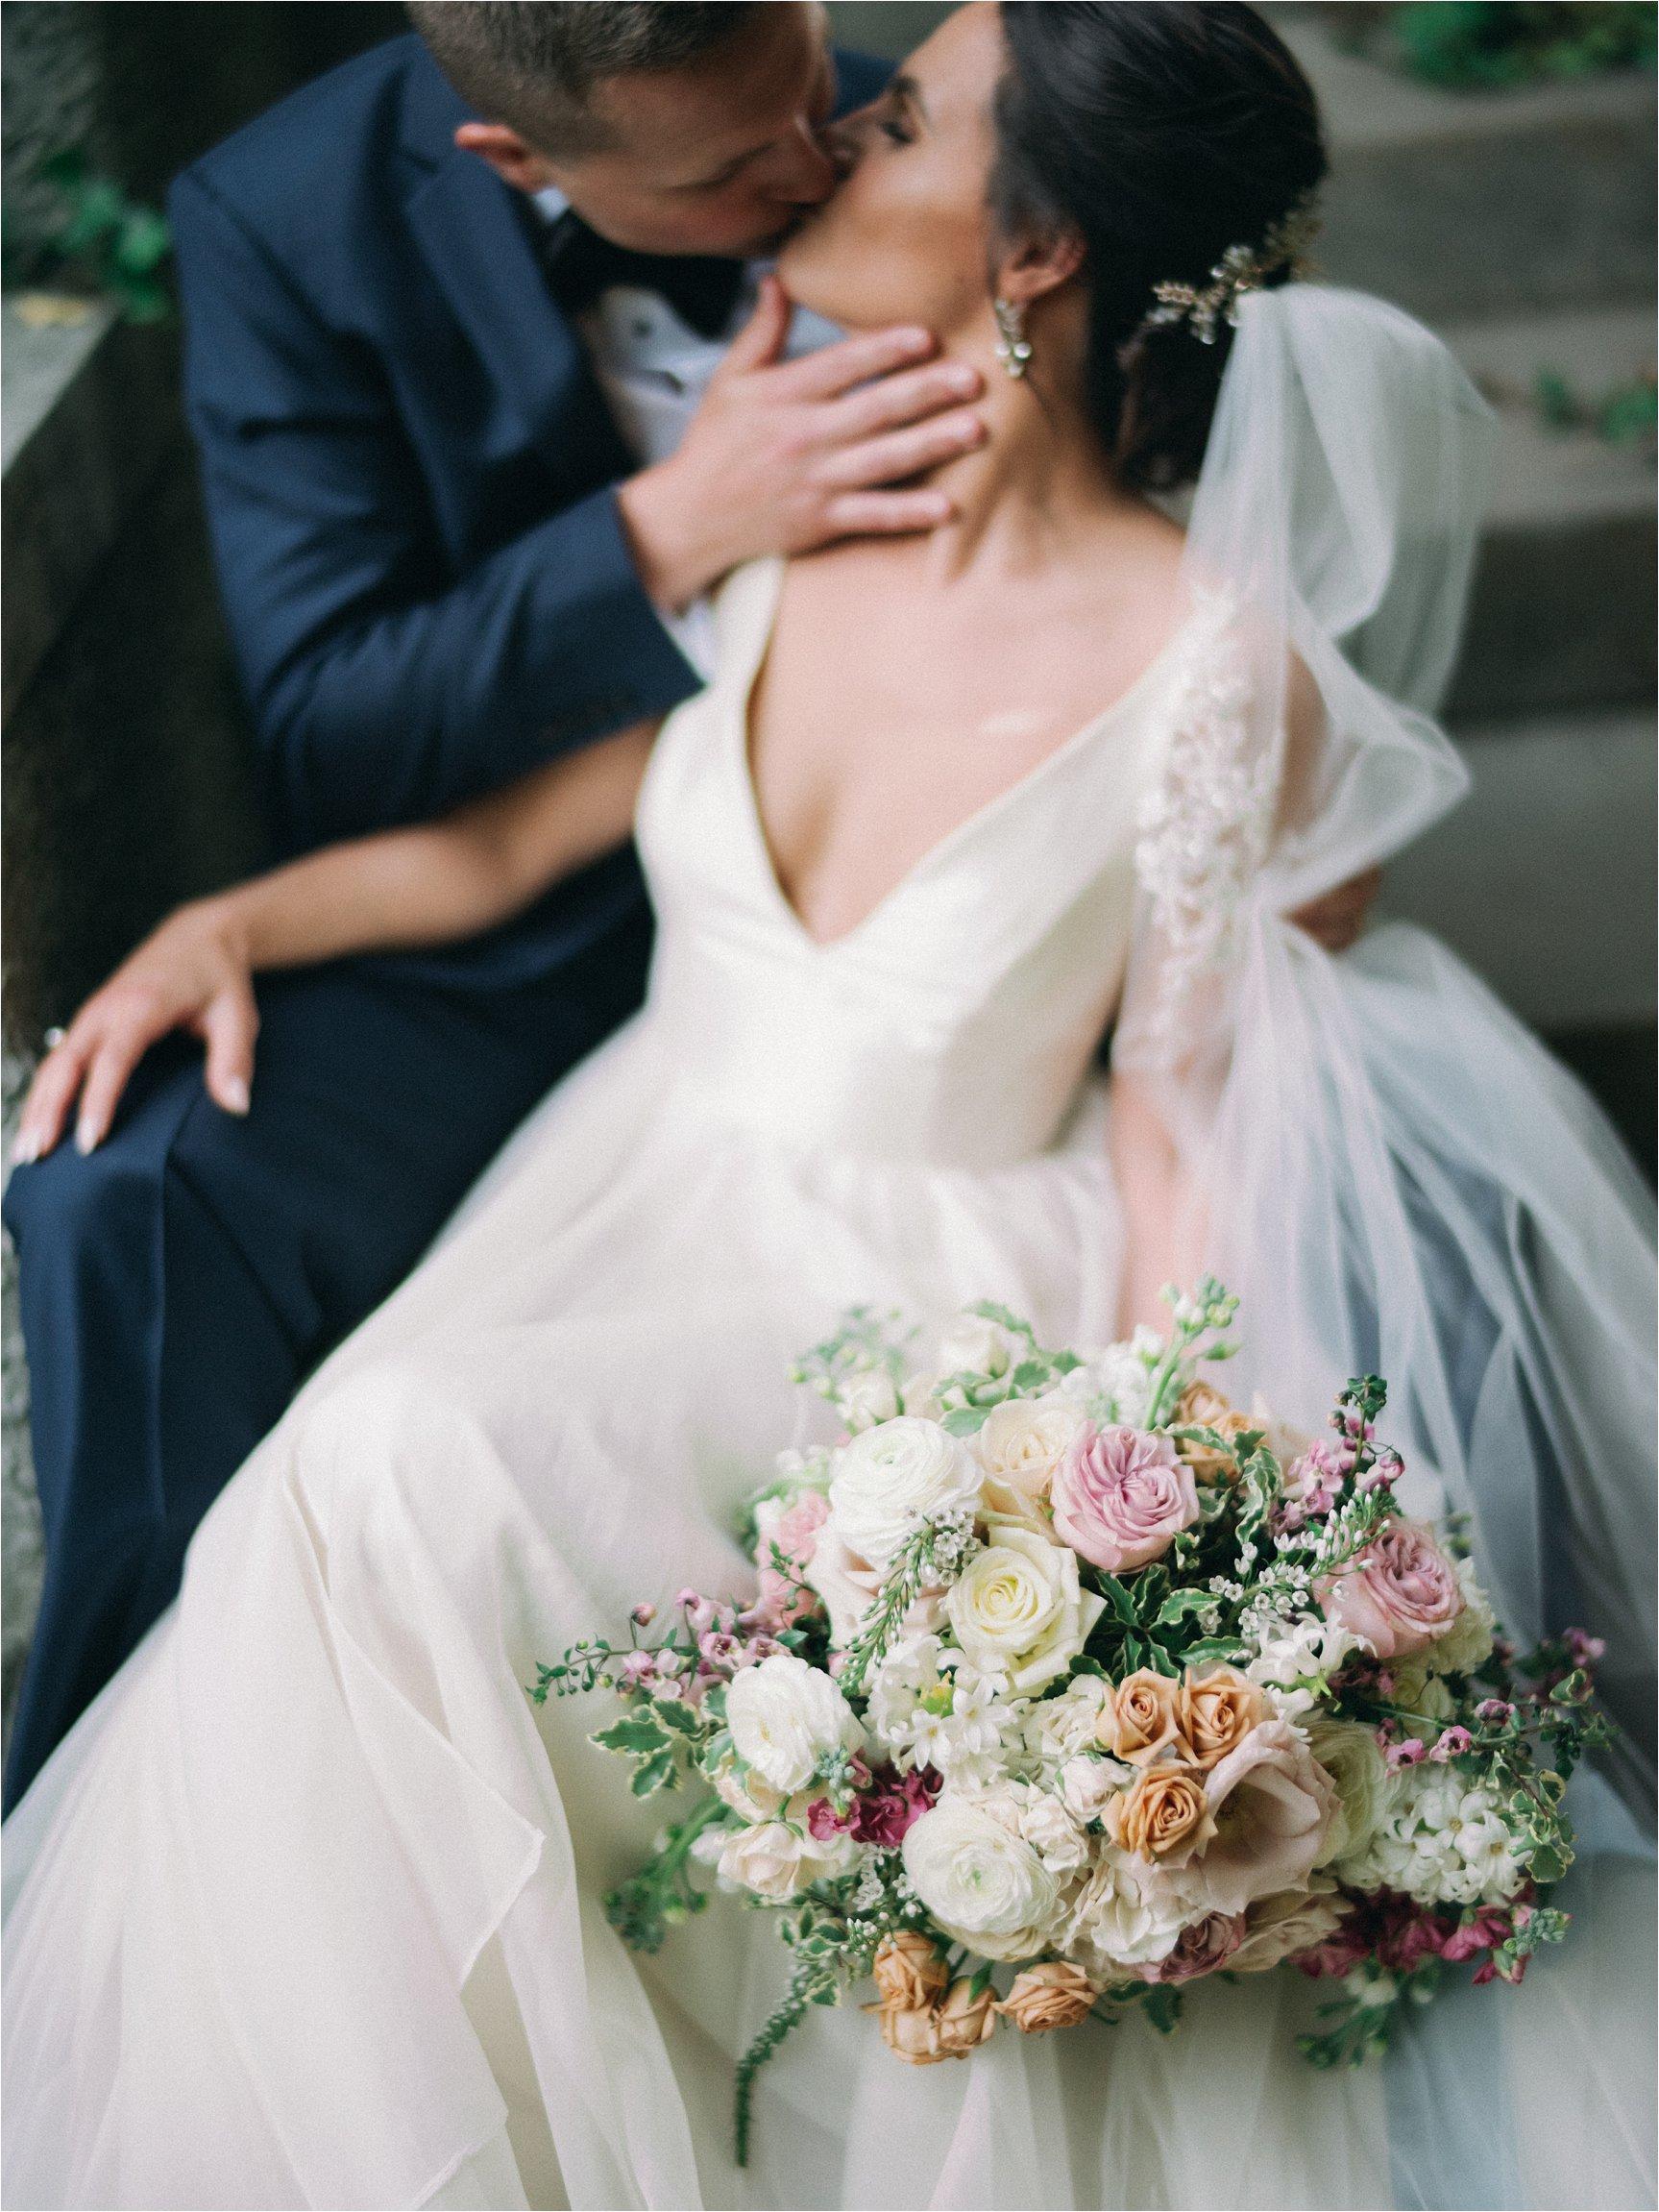 Lord_Thompson_Manor_Wedding103.JPG